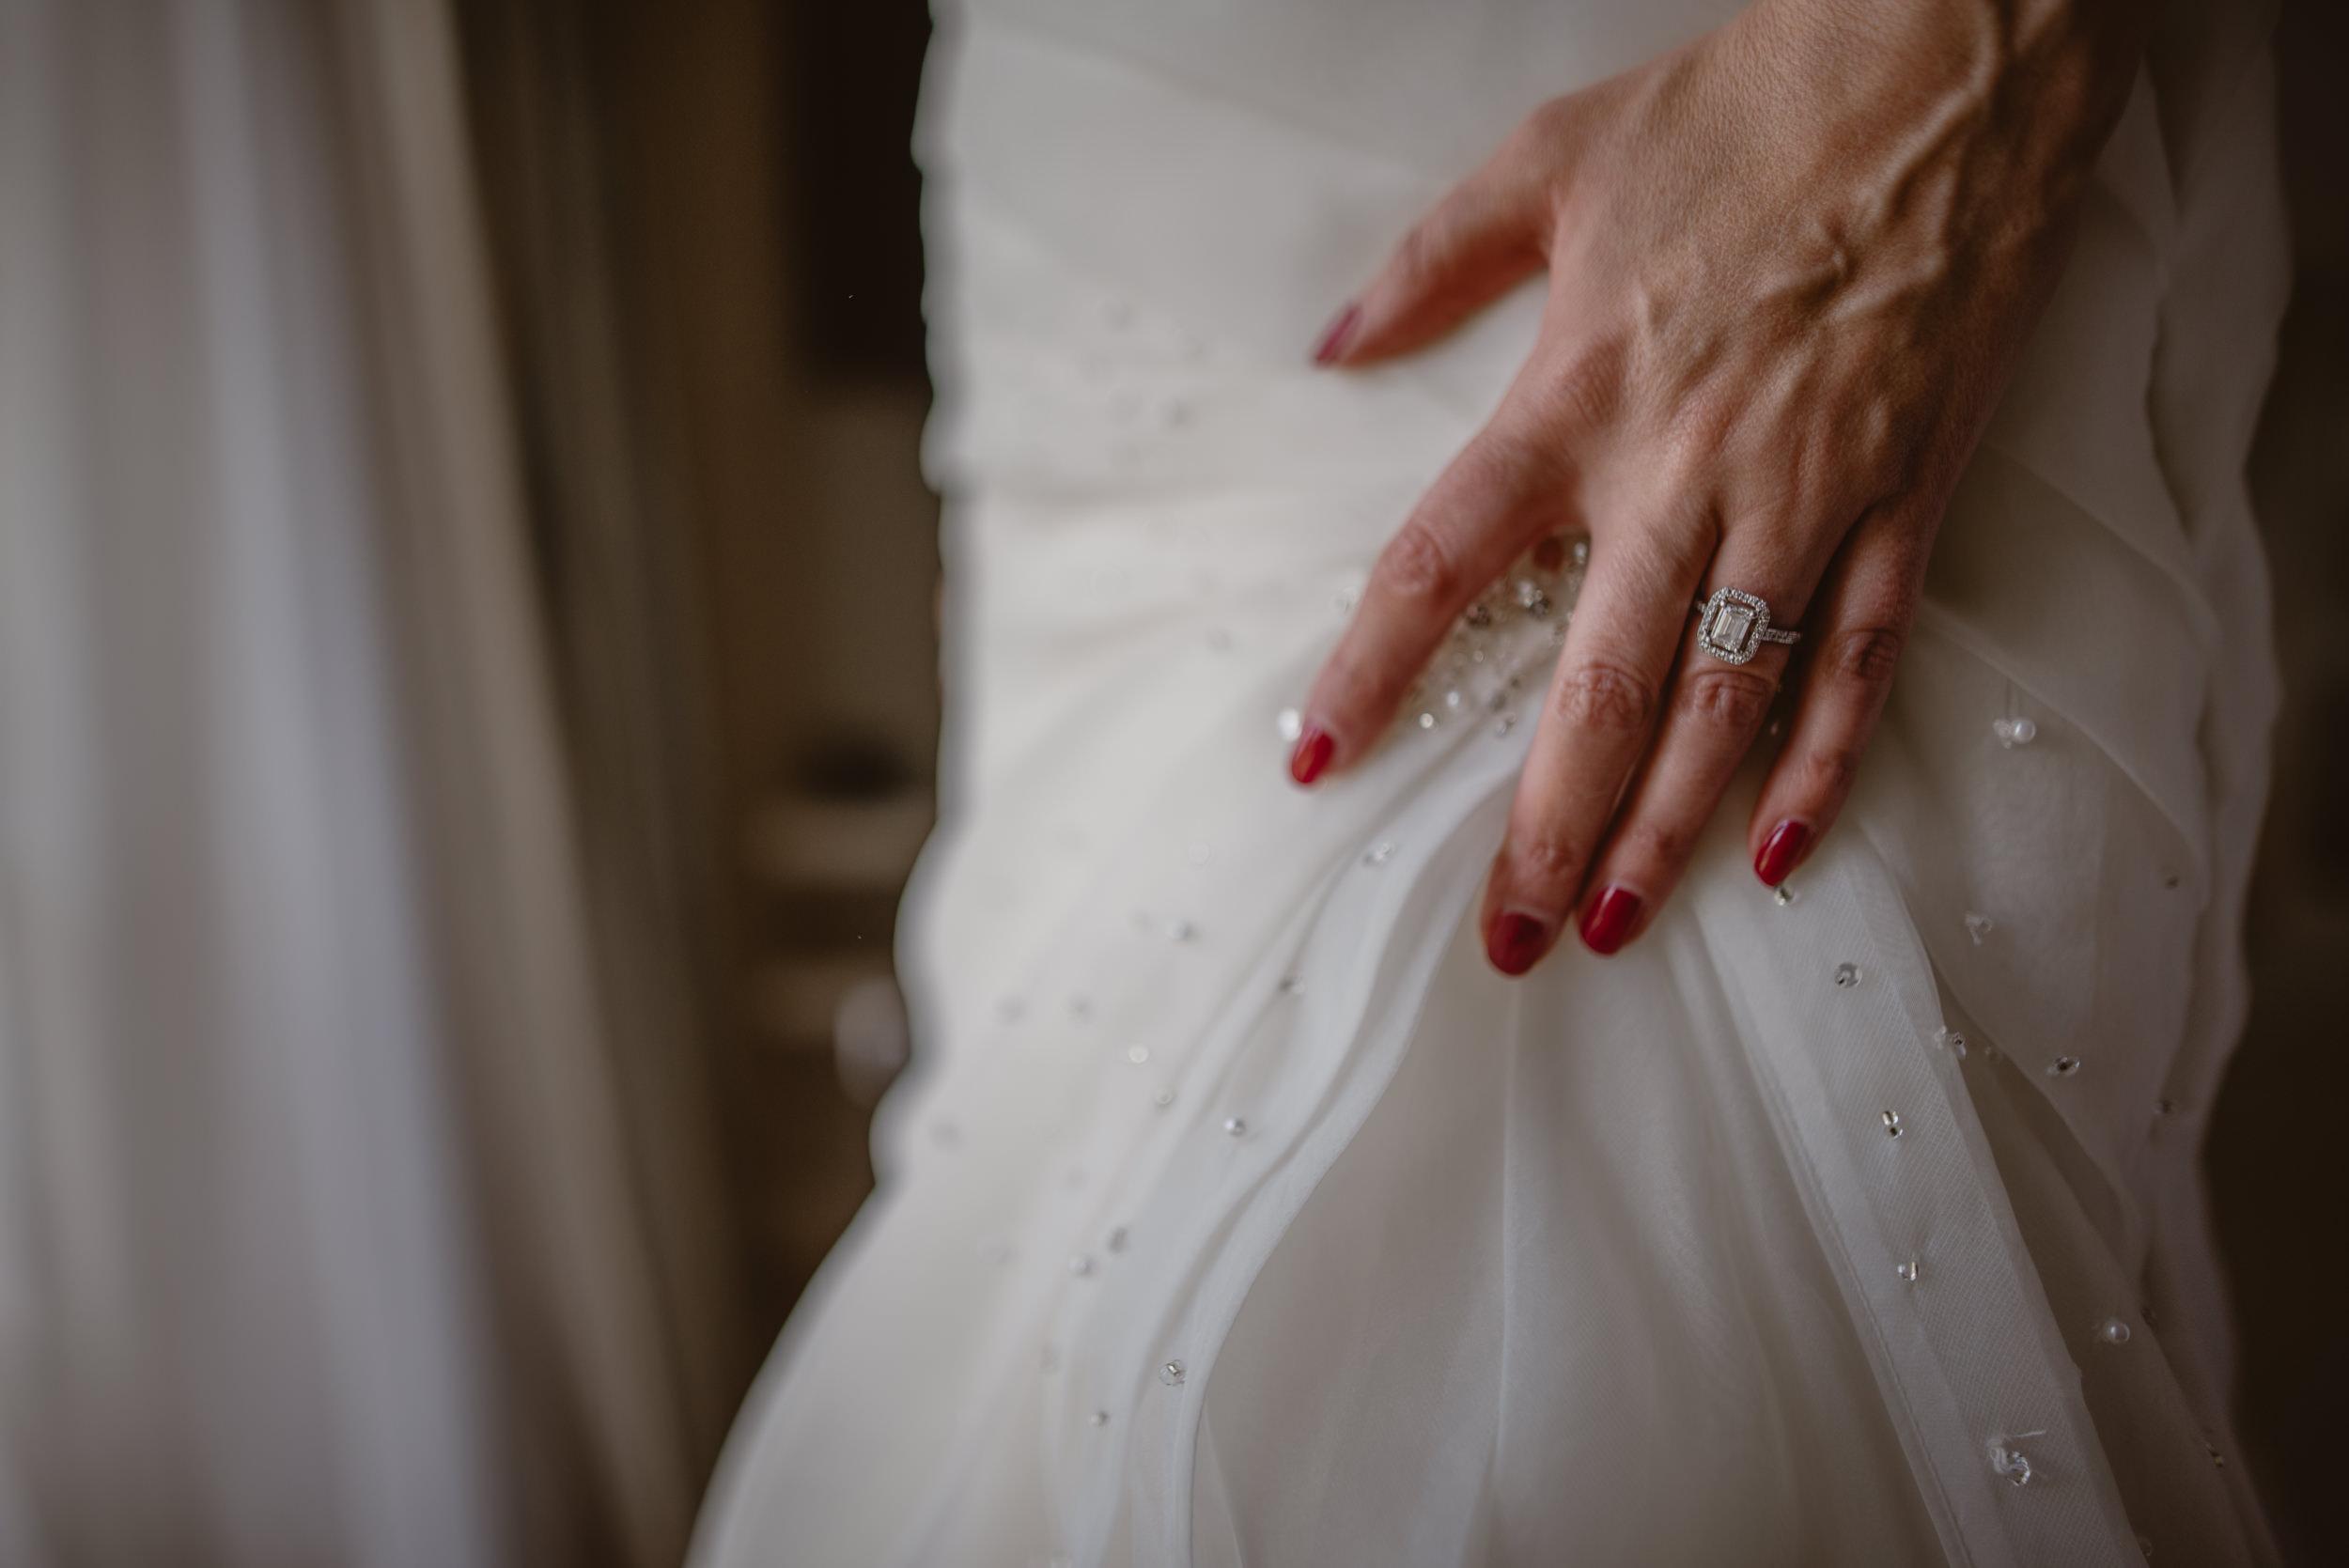 Trisha-and-Roger-wedding-The-Priory-Church-and-Chewton-Glen-Hotel-Christchurch-Manu-Mendoza-Wedding-Photography-048.jpg